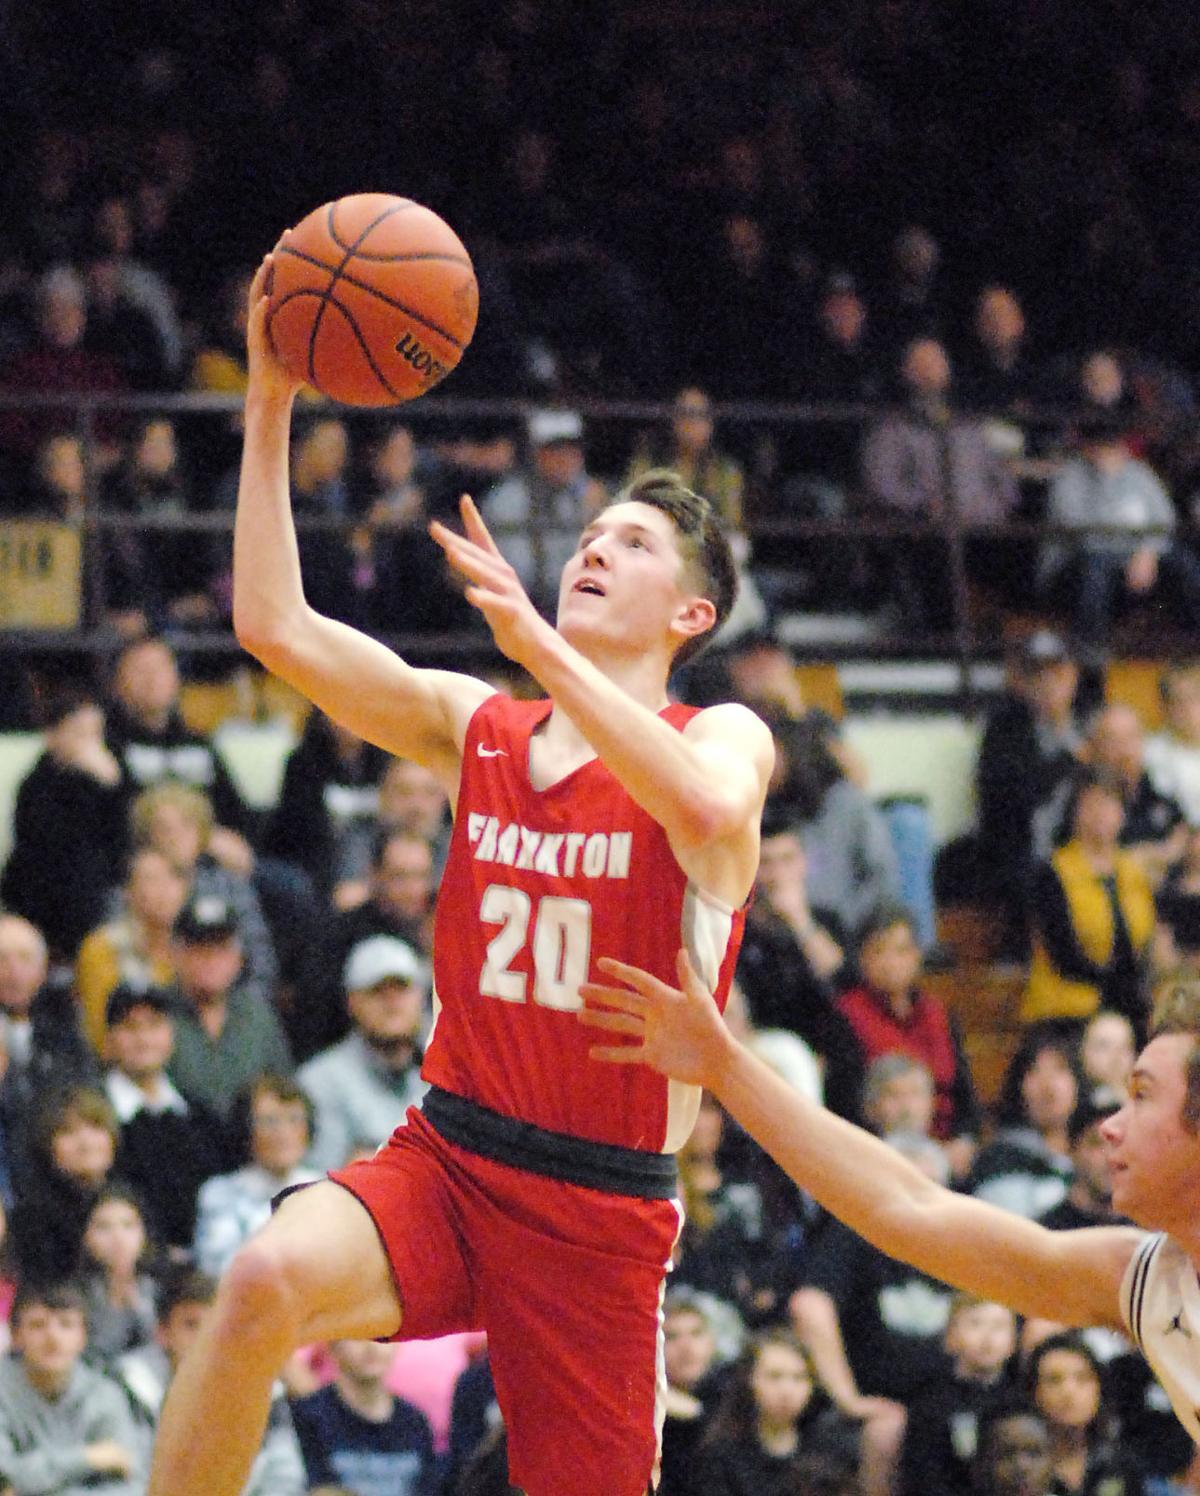 Frankton Basketball